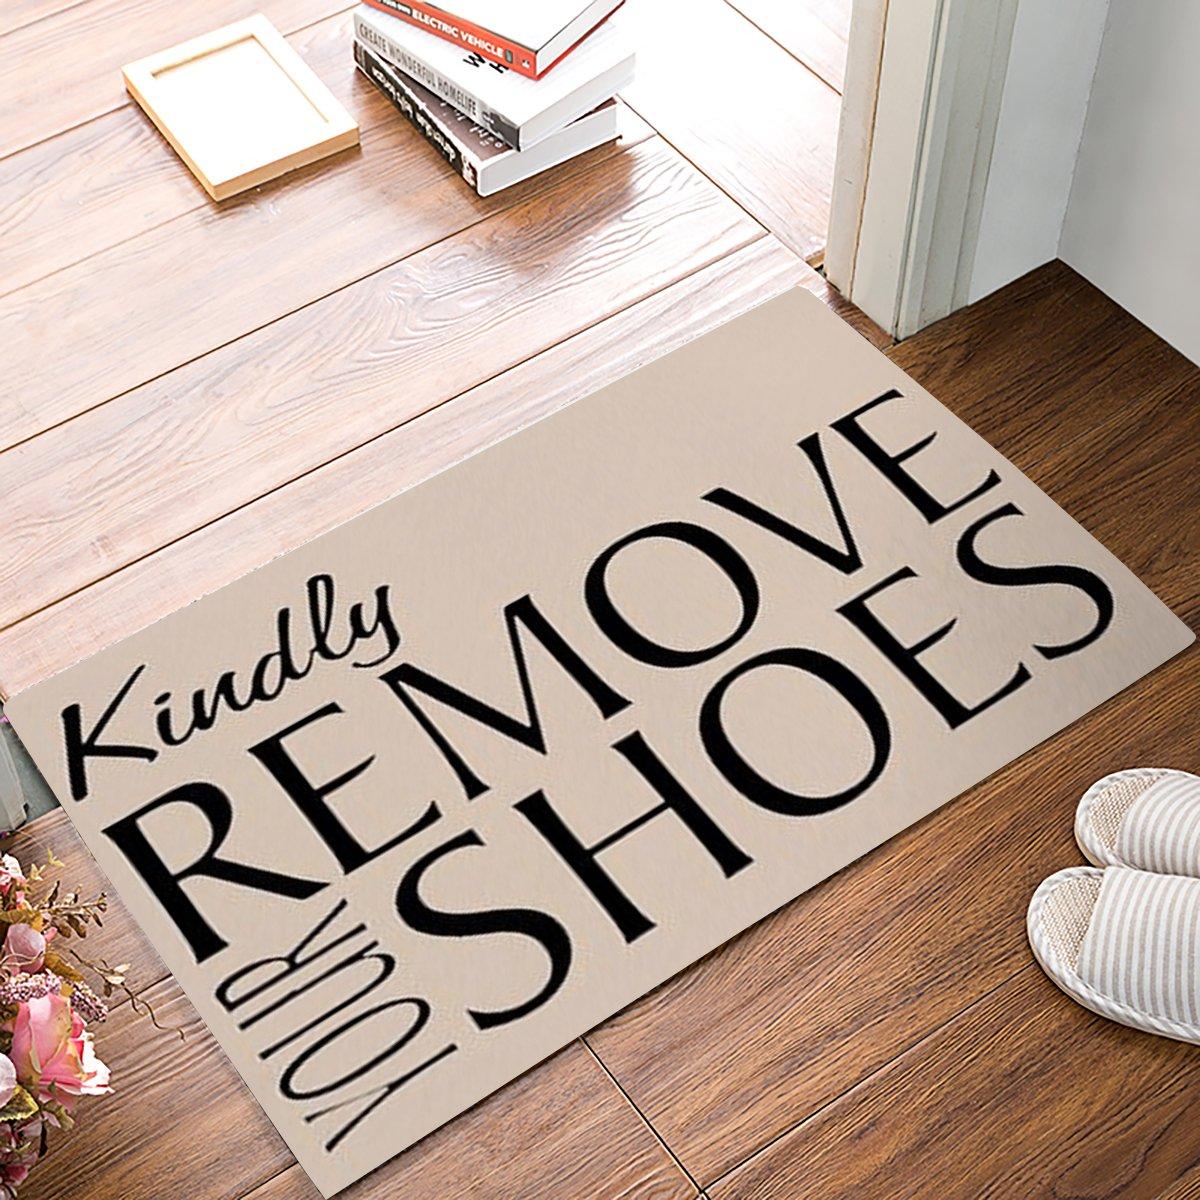 Non-Skid//Slip Back Door Mat Rug Kindly Remove Your Shoes Thin Low Pile Machine Washable Indoor Bathroom Kitchen Hallway Inside Entrance Rugs 18 x 30 KAROLA